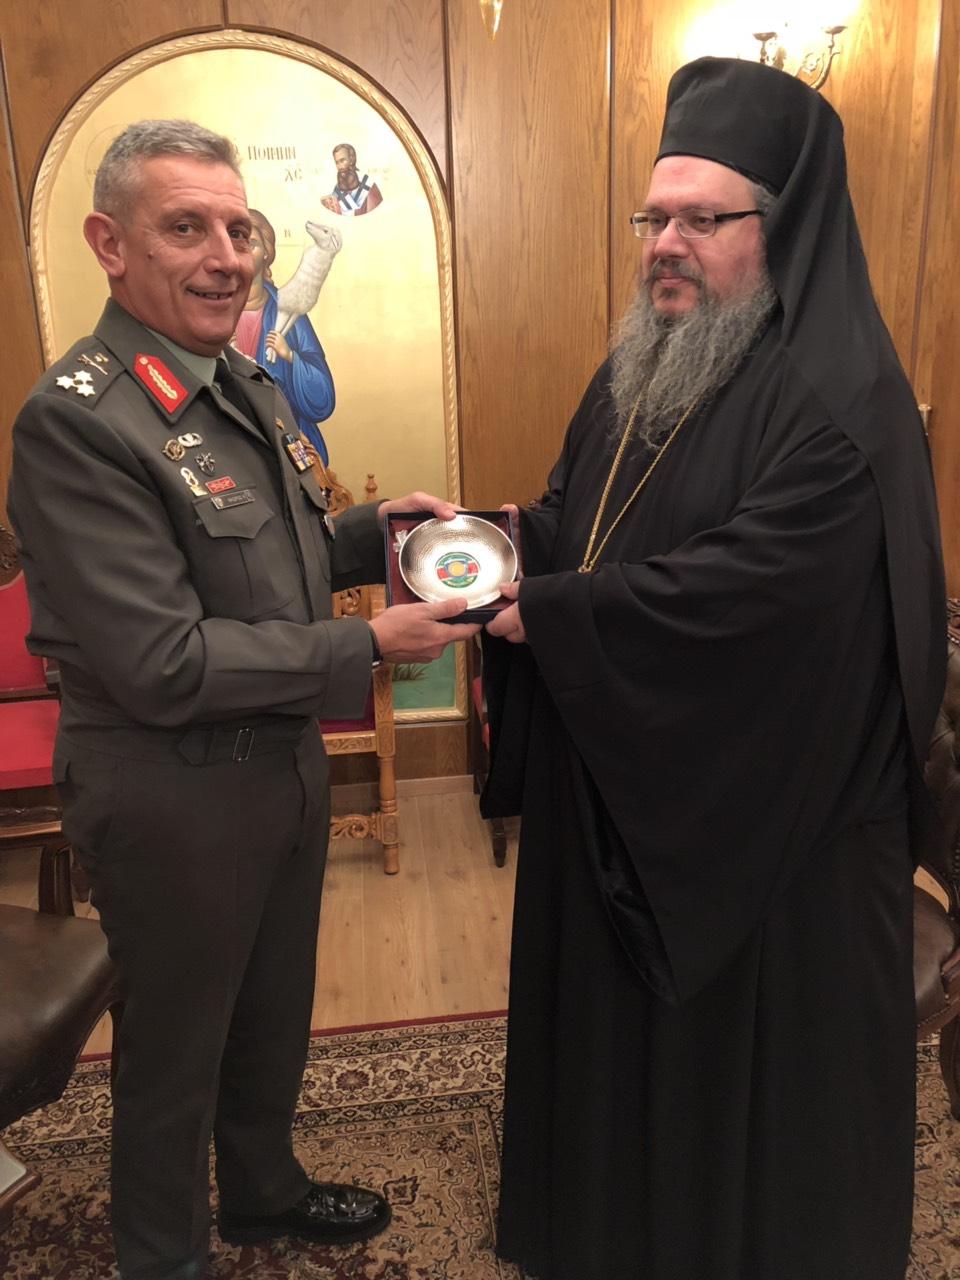 dktis 1iStratia floros 4 - Στον Σεβασμιώτατο ο νέος διοικητής της 1ης Στρατιάς